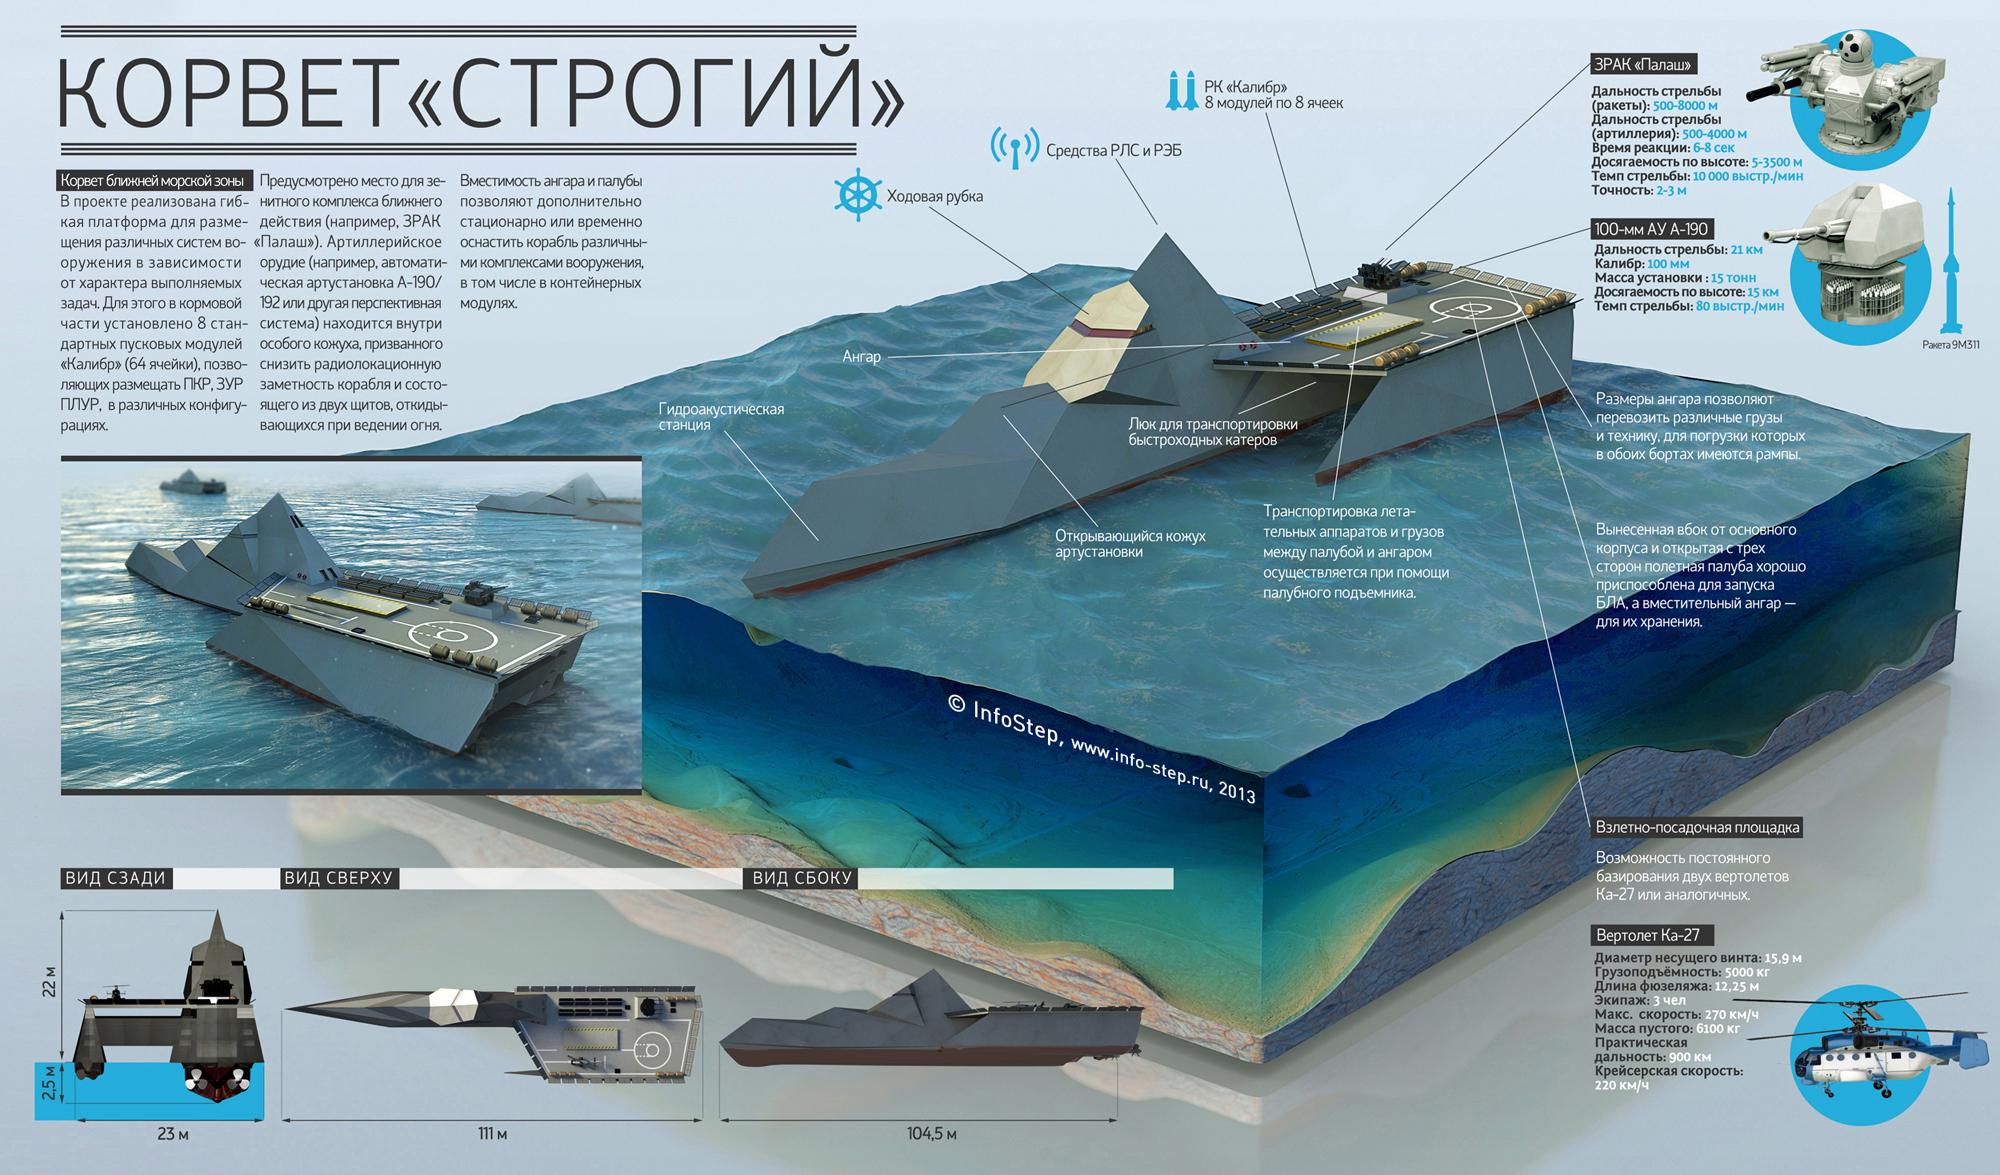 Russian Navy: Status & News #1 - Page 36 Thumbs_lang_voenka_corvet_strogij_0